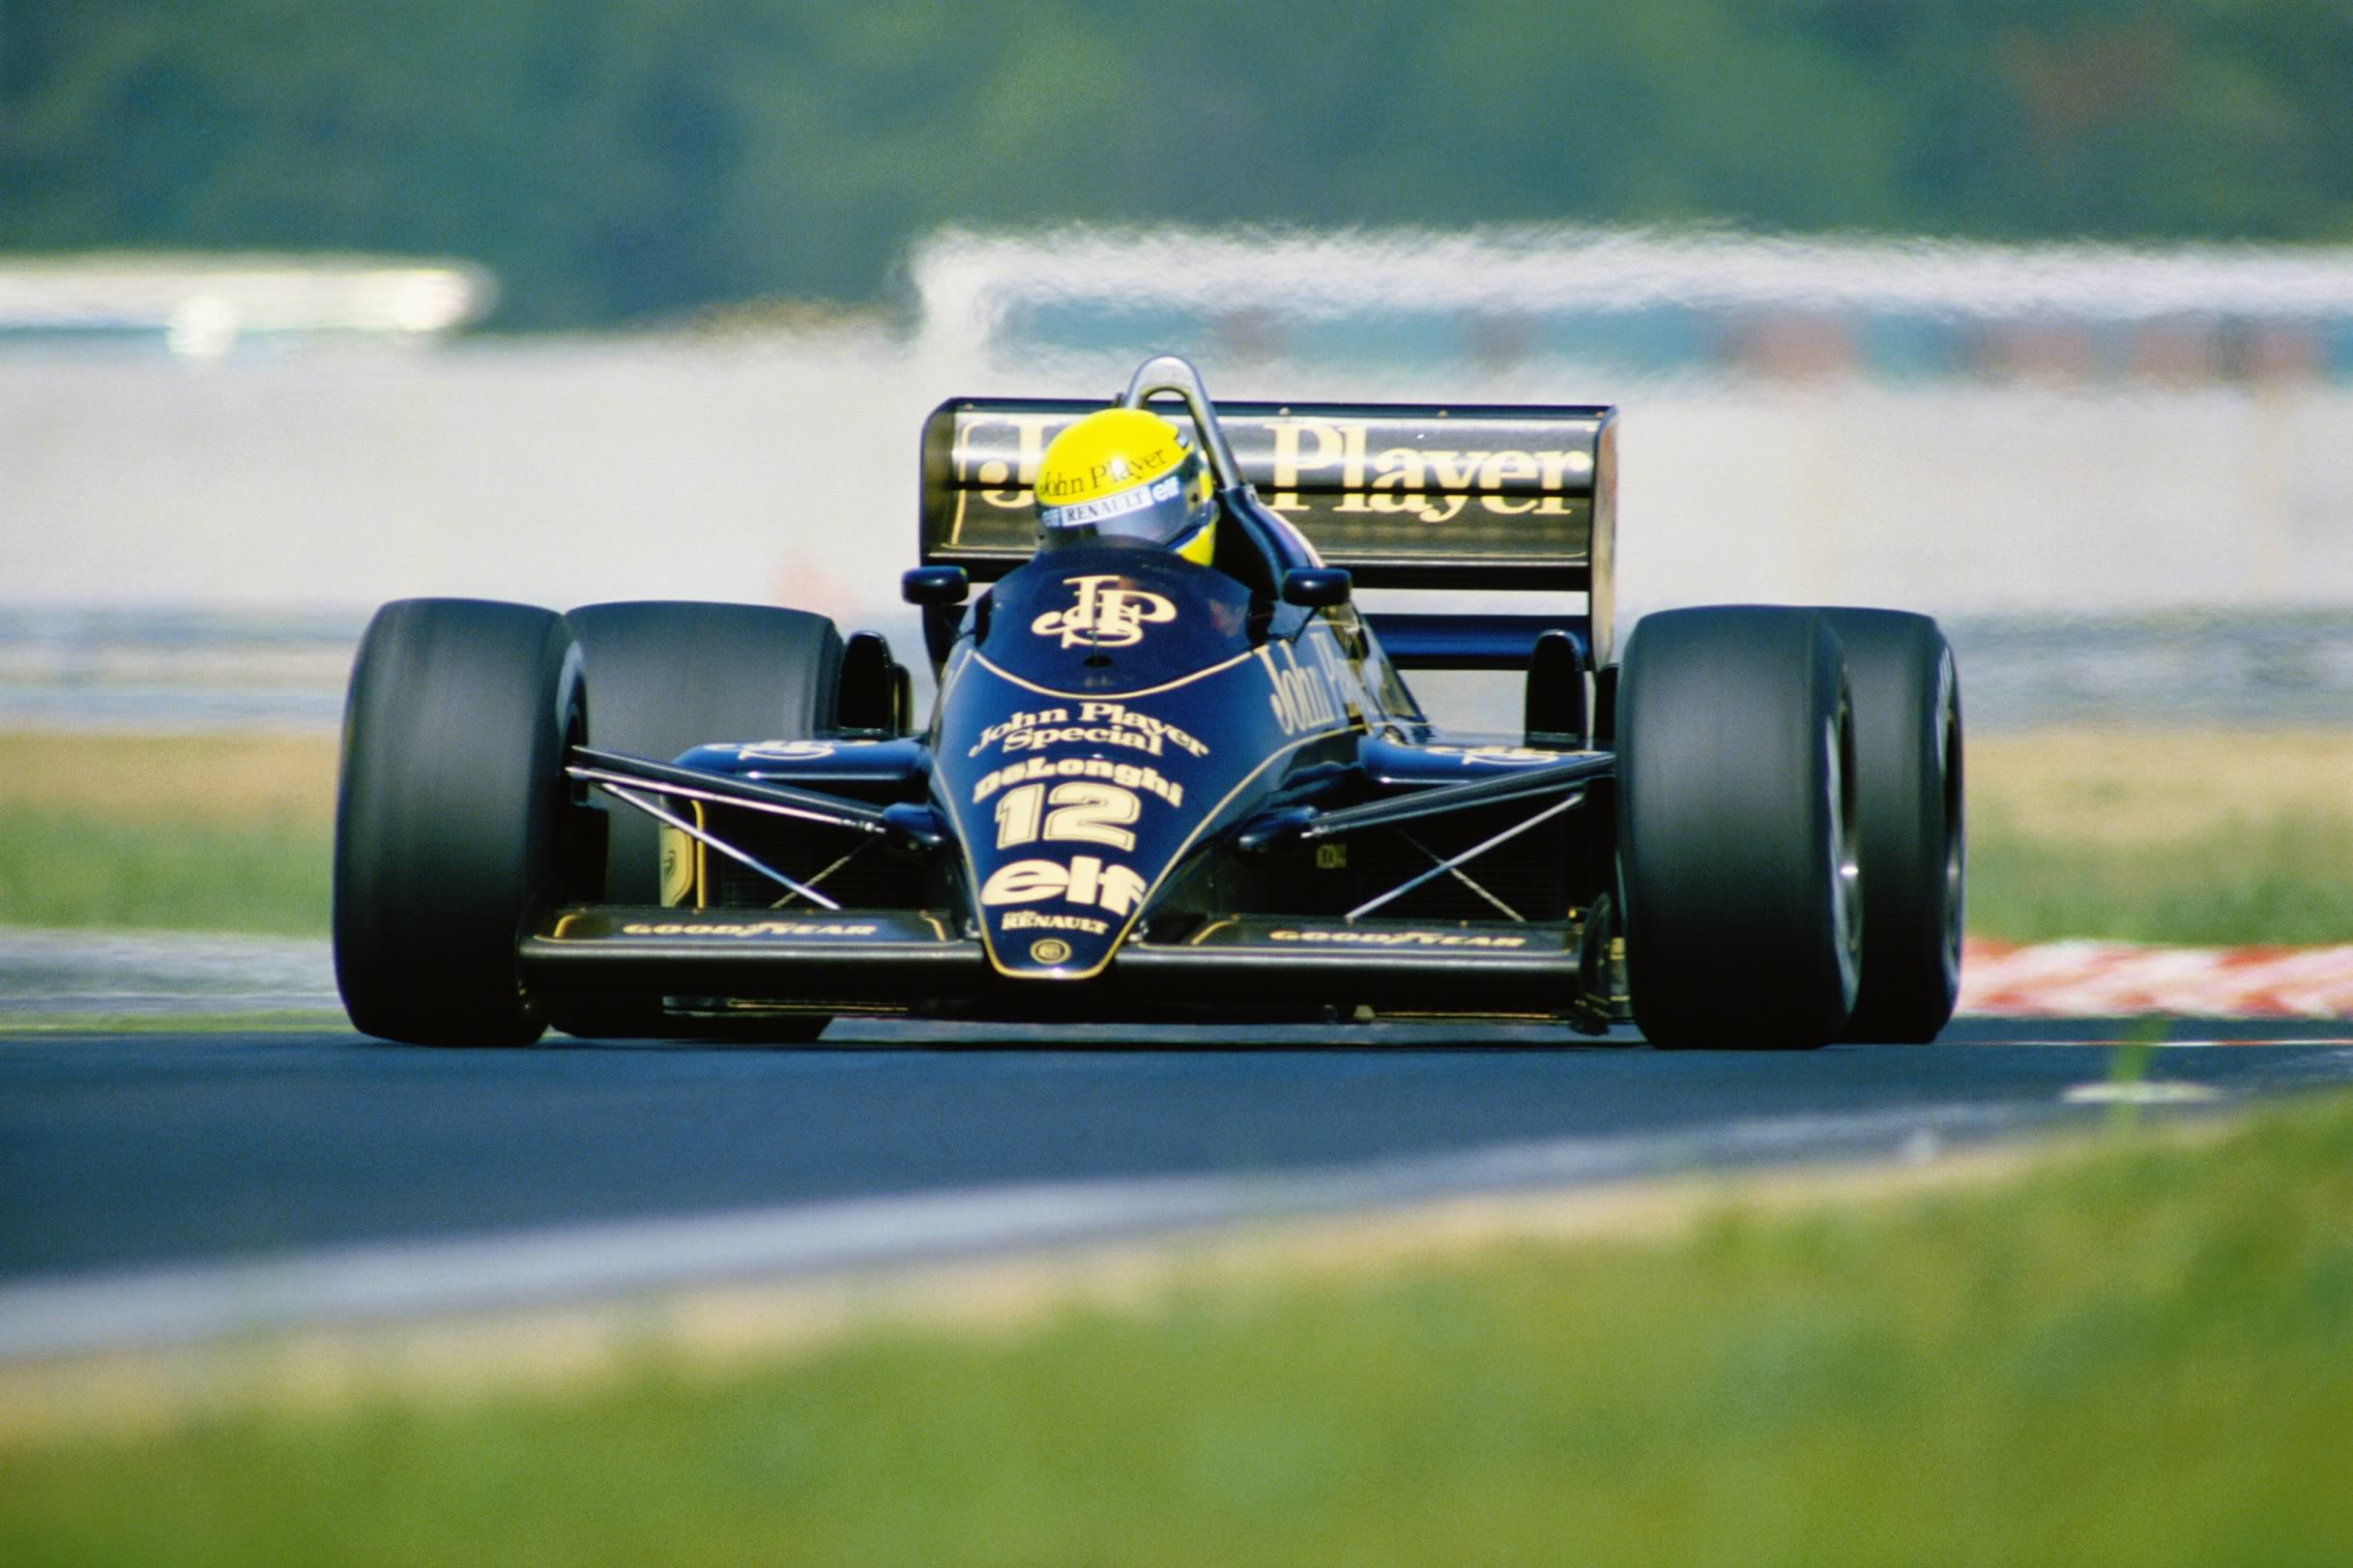 1986Hungaroring Ayrton Senna Lotus 98T